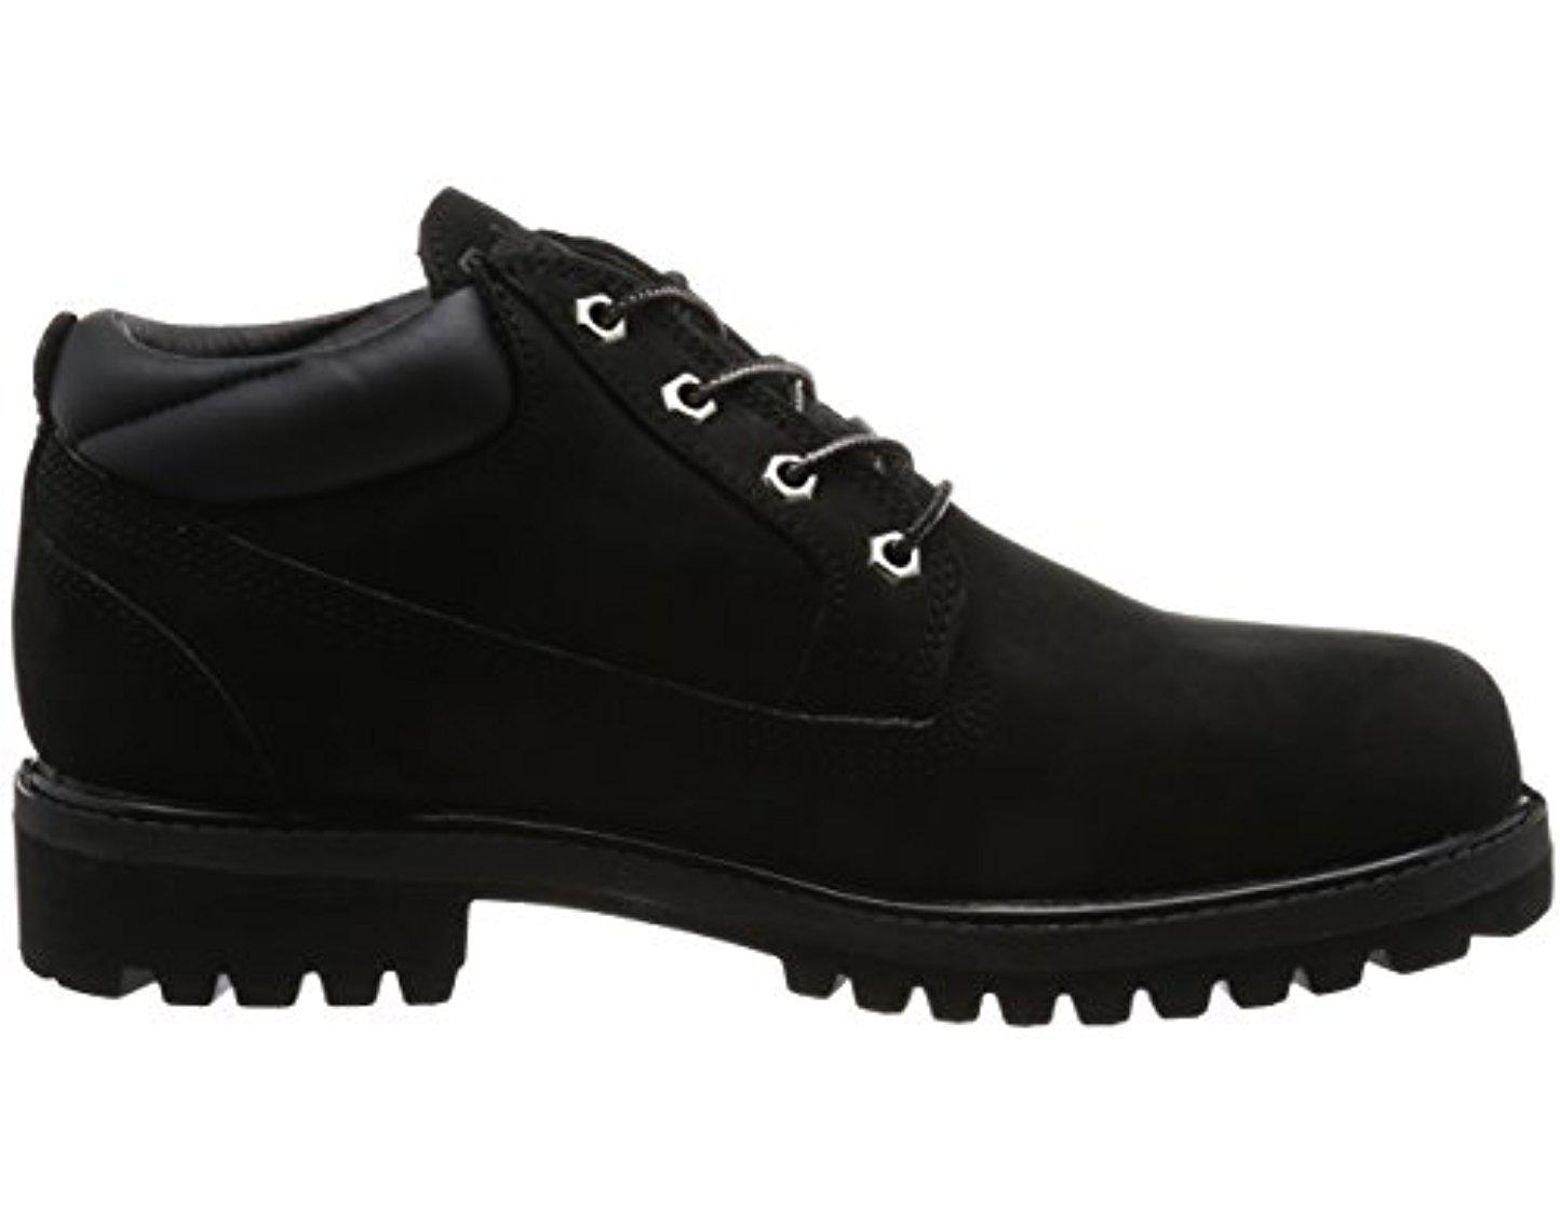 35ec61a571f Men's Black Icon Premium Waterproof Oxford